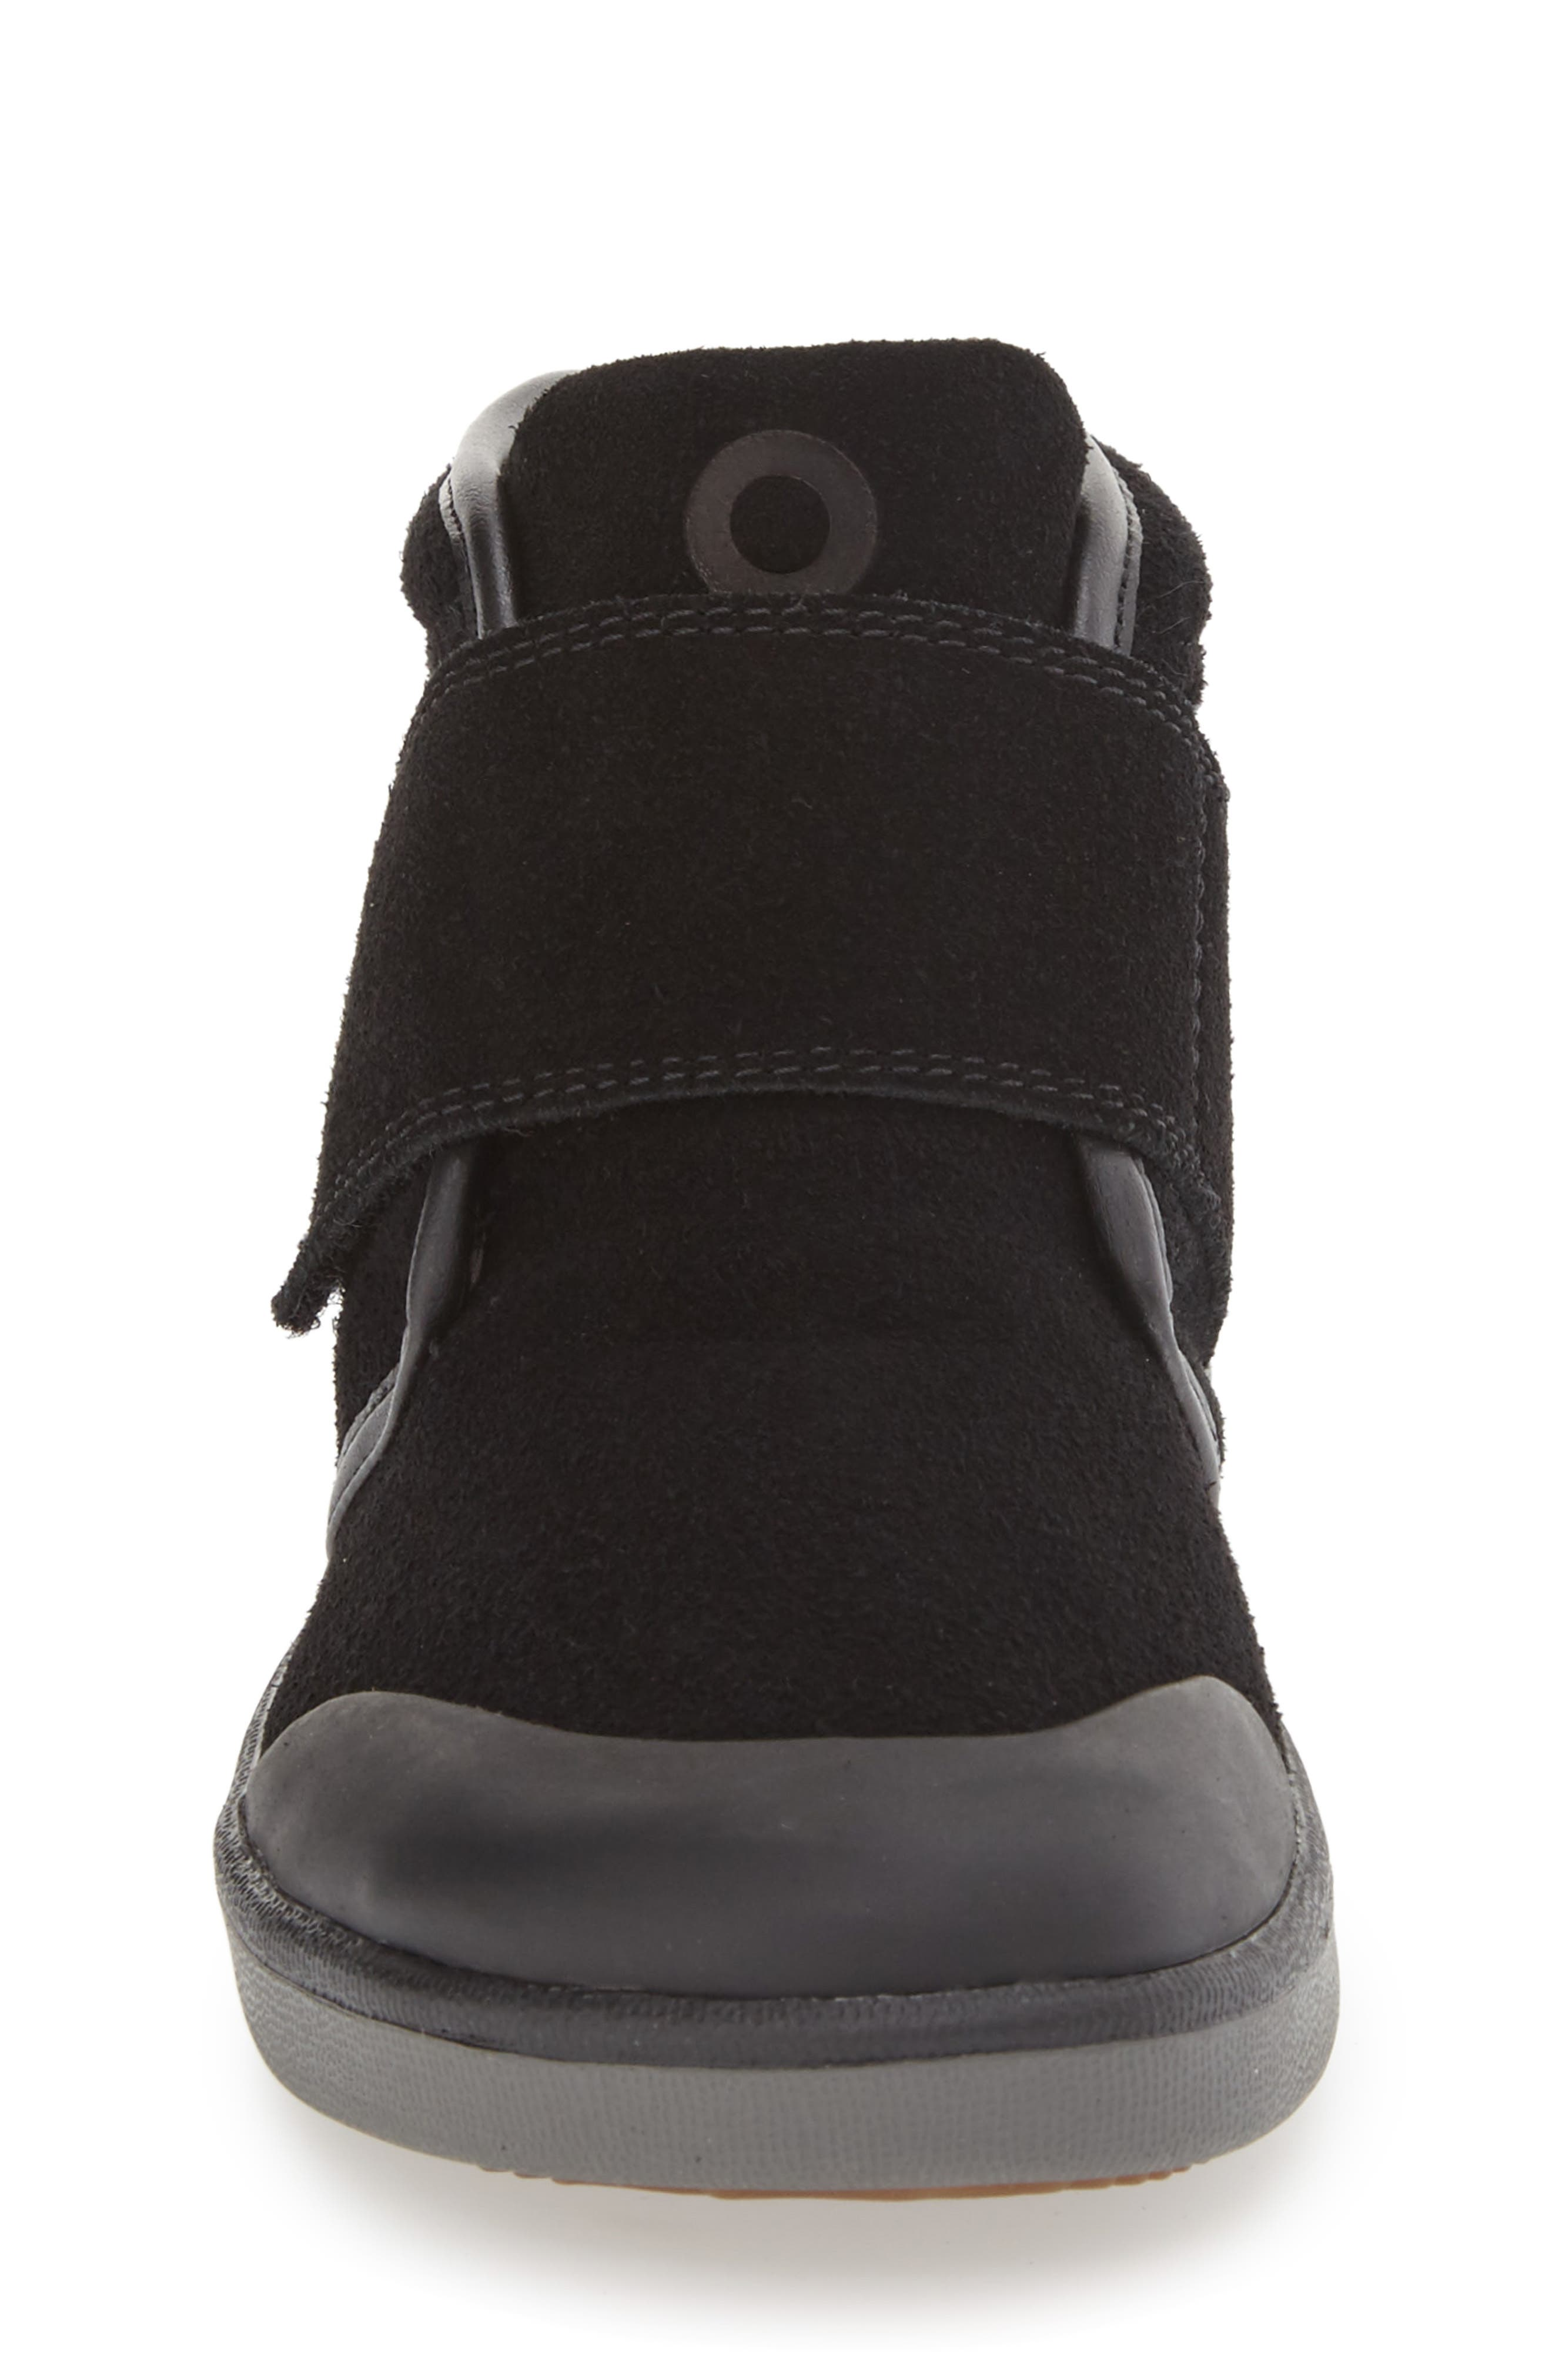 'Sammy' Waterproof Sneaker,                             Alternate thumbnail 4, color,                             BLACK/ BLACK